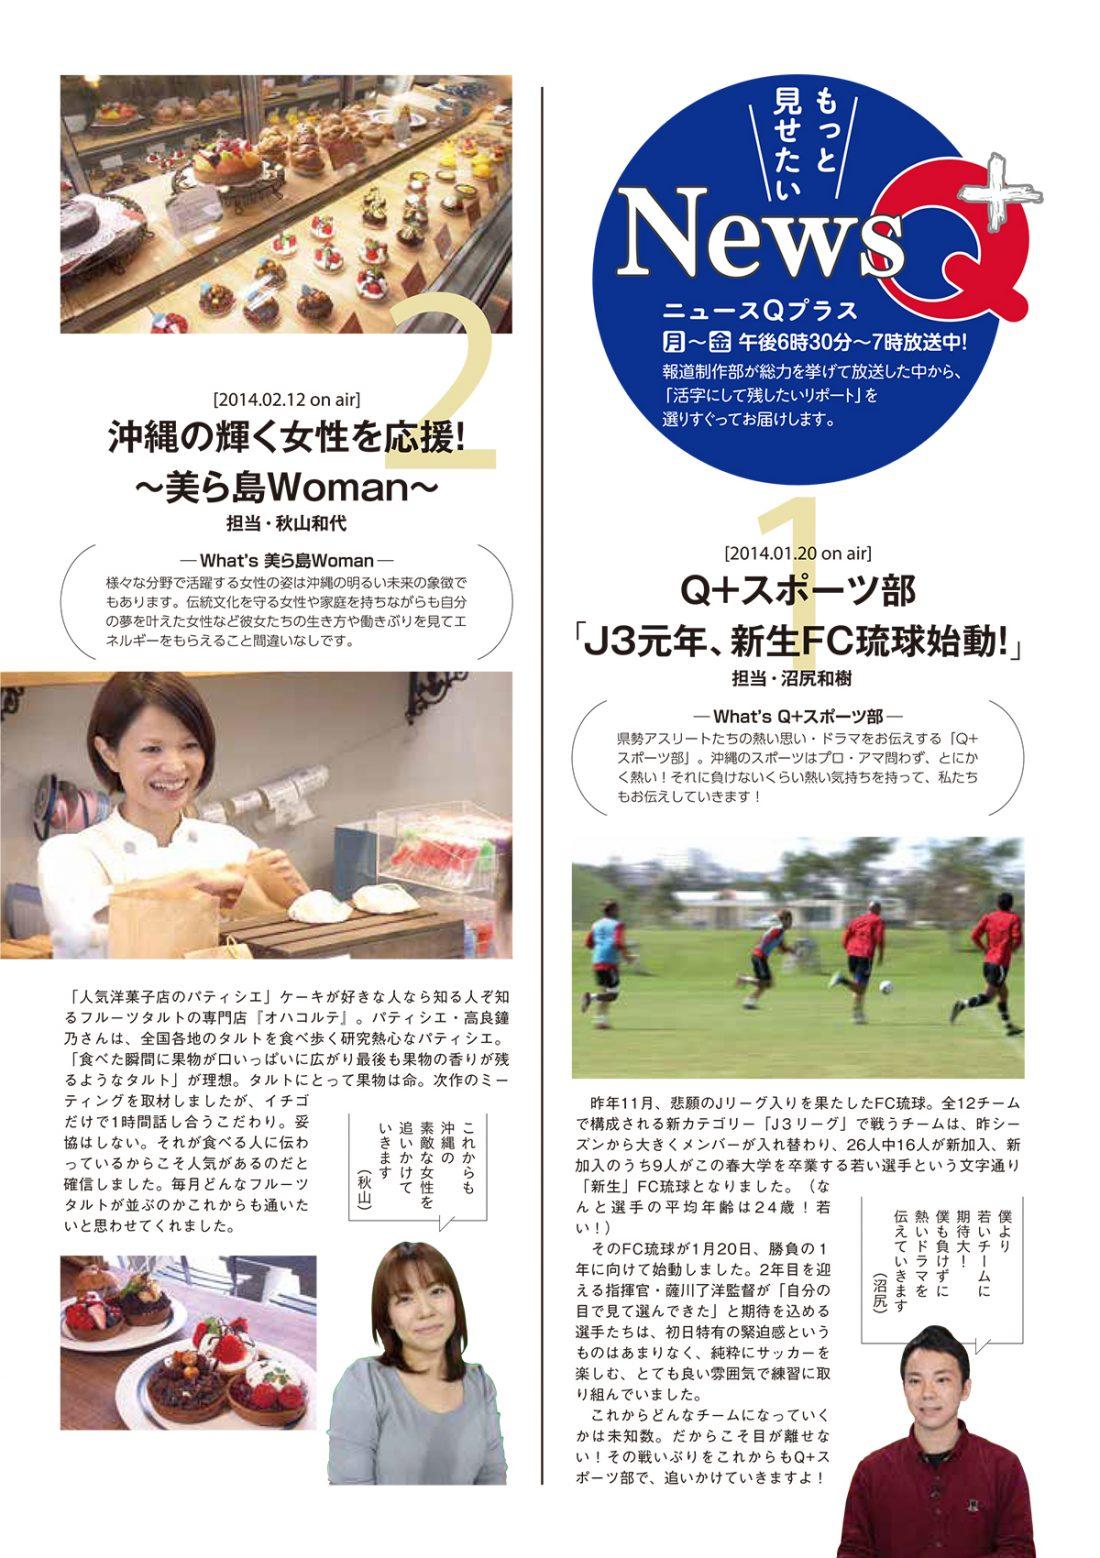 http://www.qab.co.jp/qgoro/wp-content/uploads/quun_0108-1100x1558.jpg